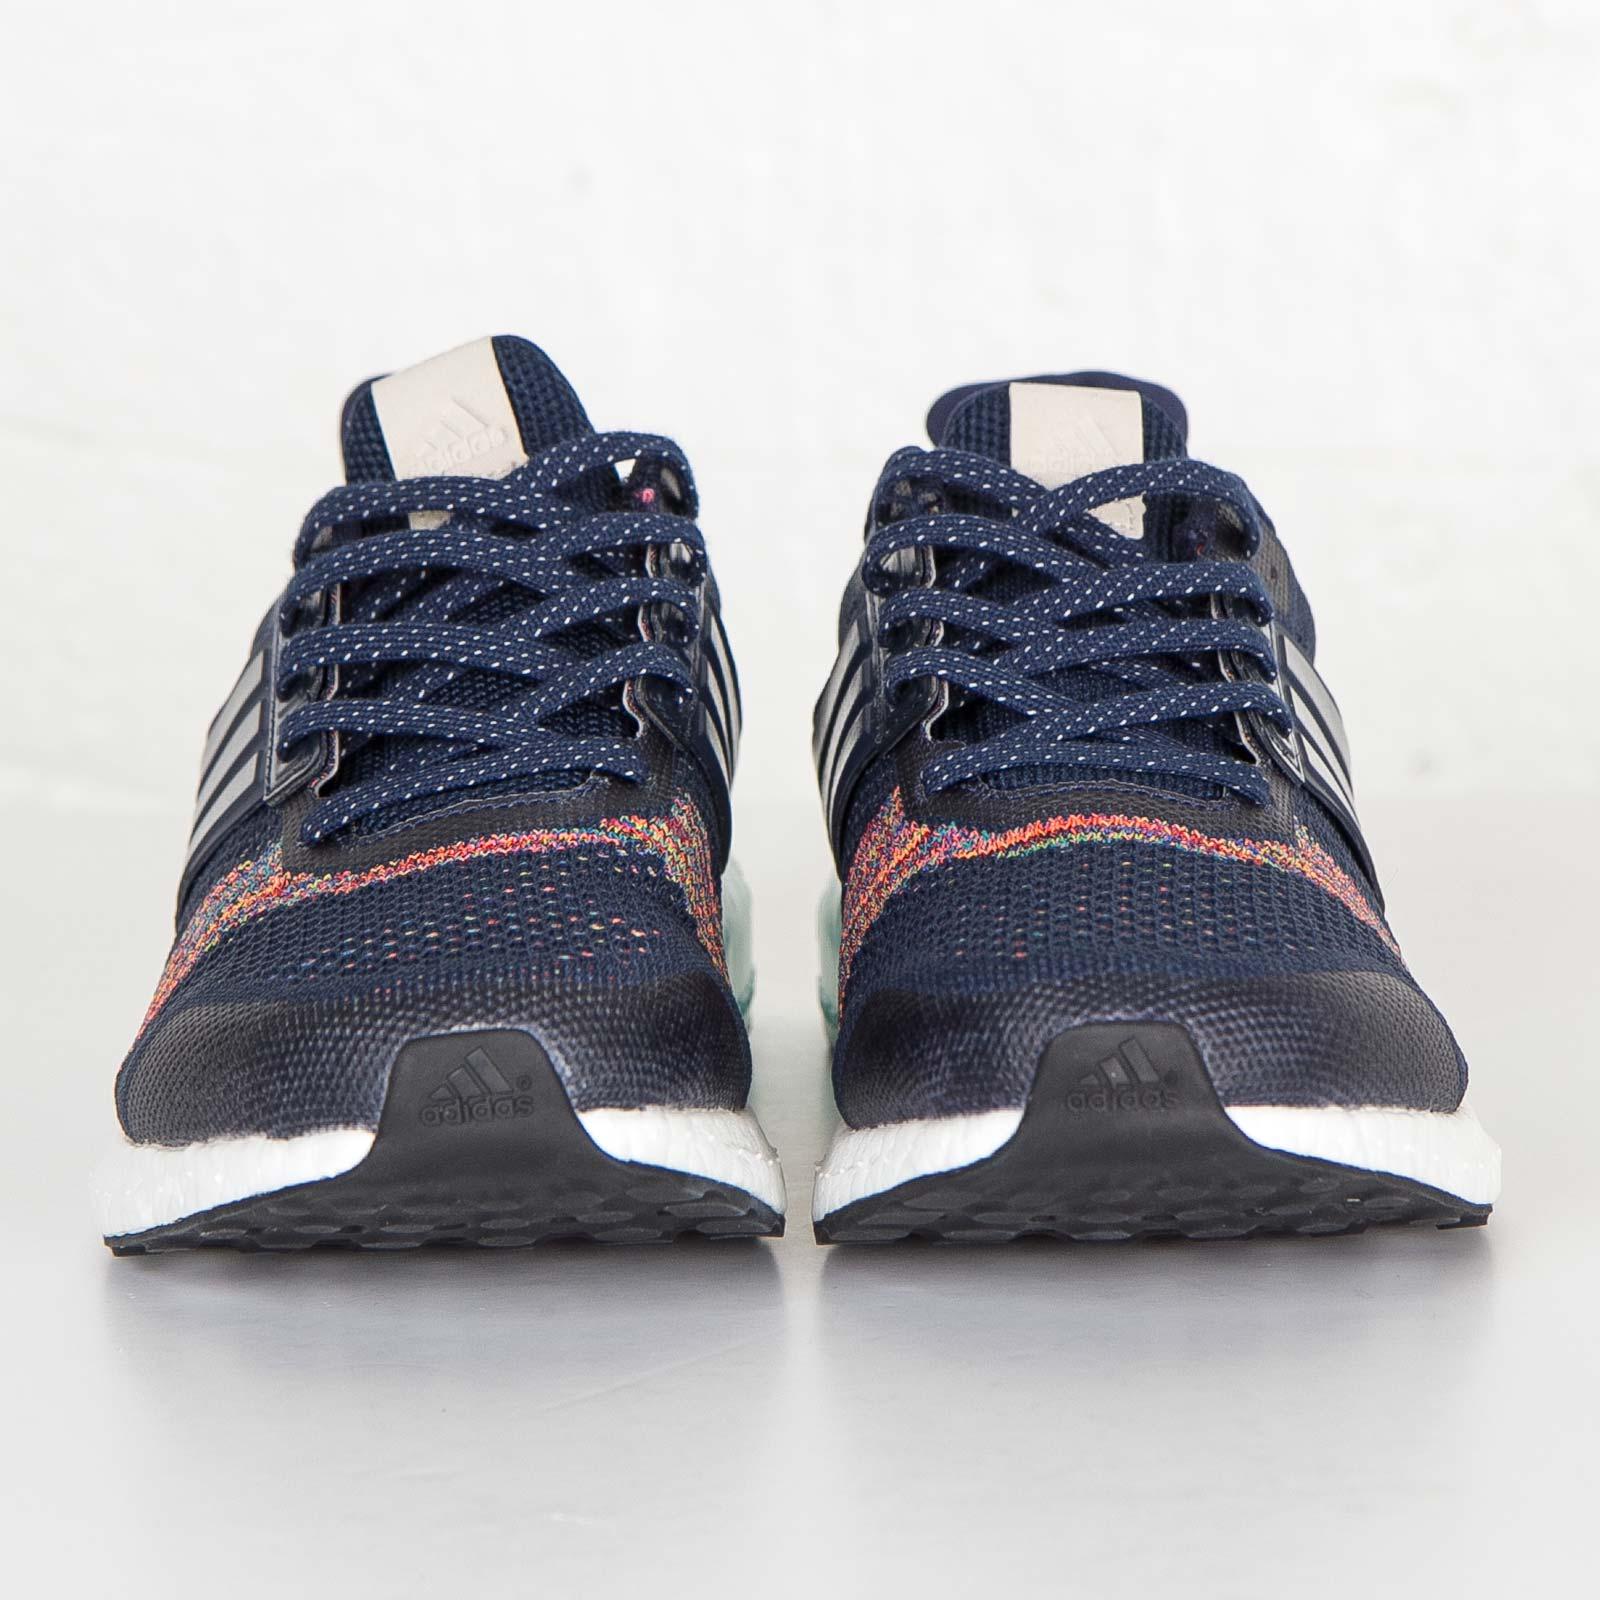 premium selection b43e7 c6833 adidas Ultra Boost ST Ltd adidas Ultra Boost ST Ltd ...